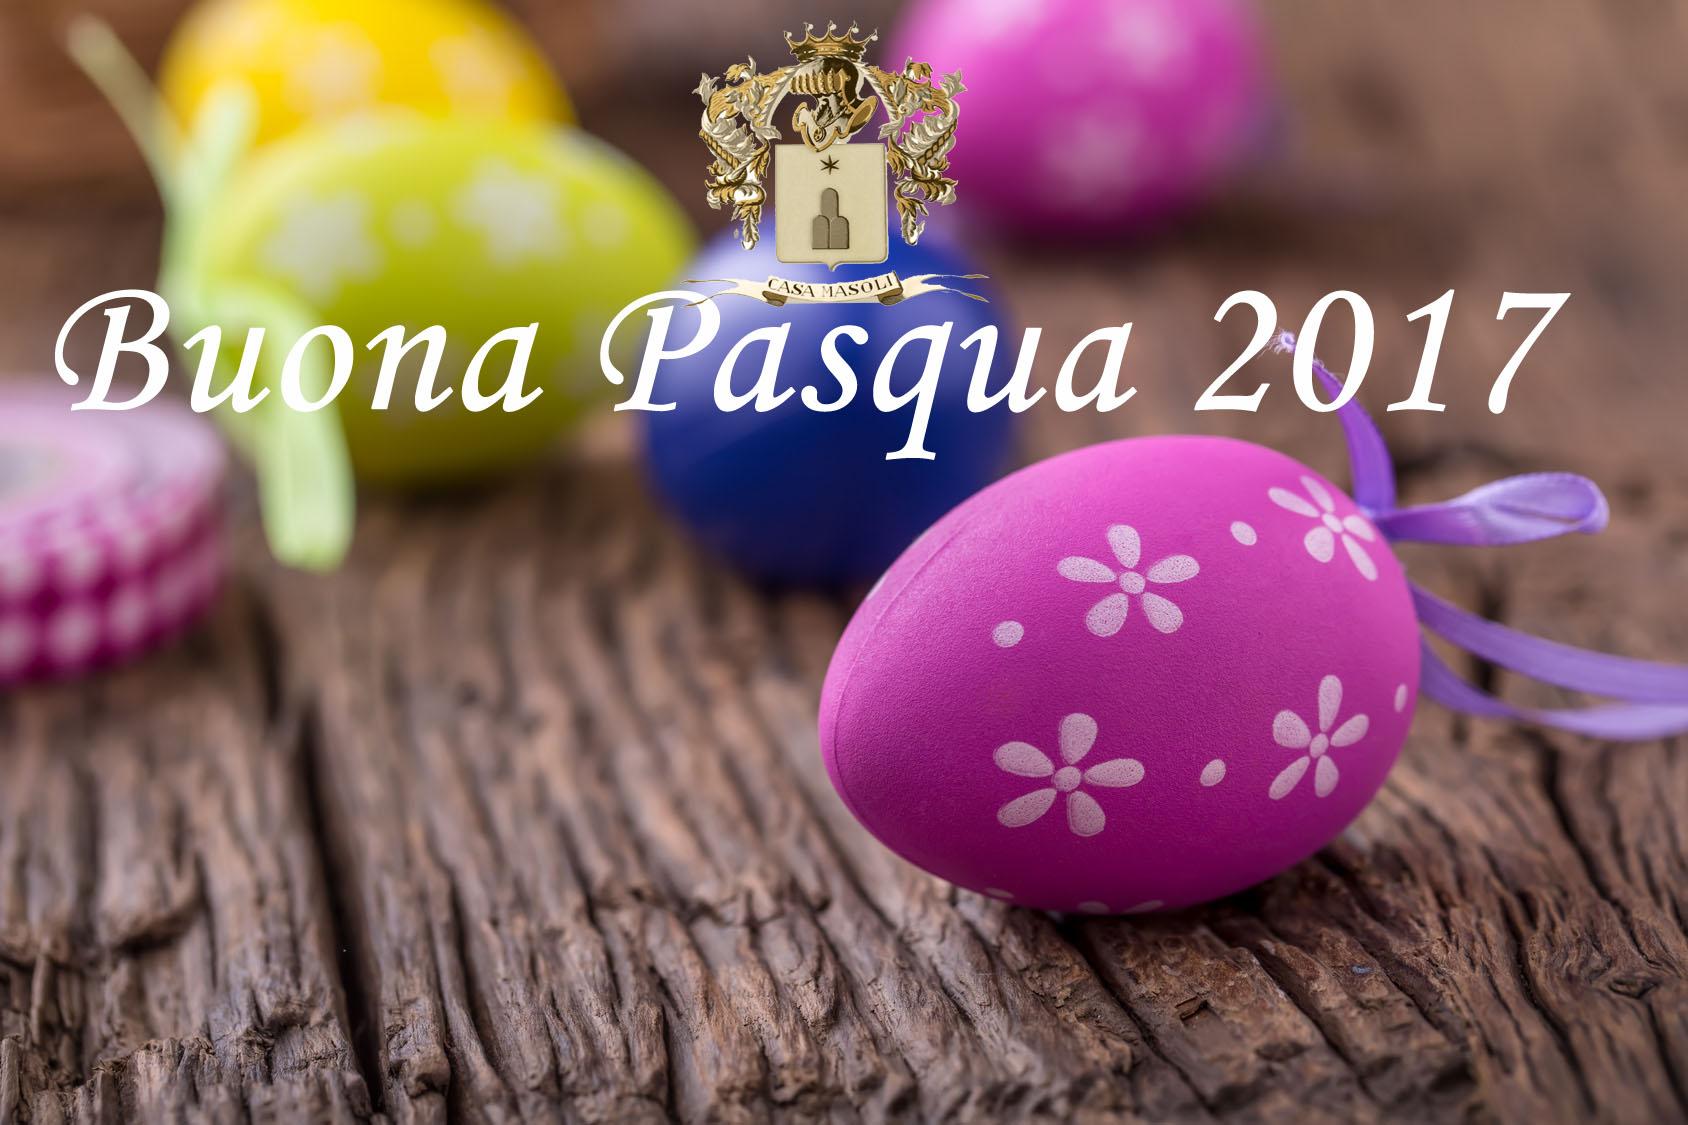 Pasqua2017-2.jpg